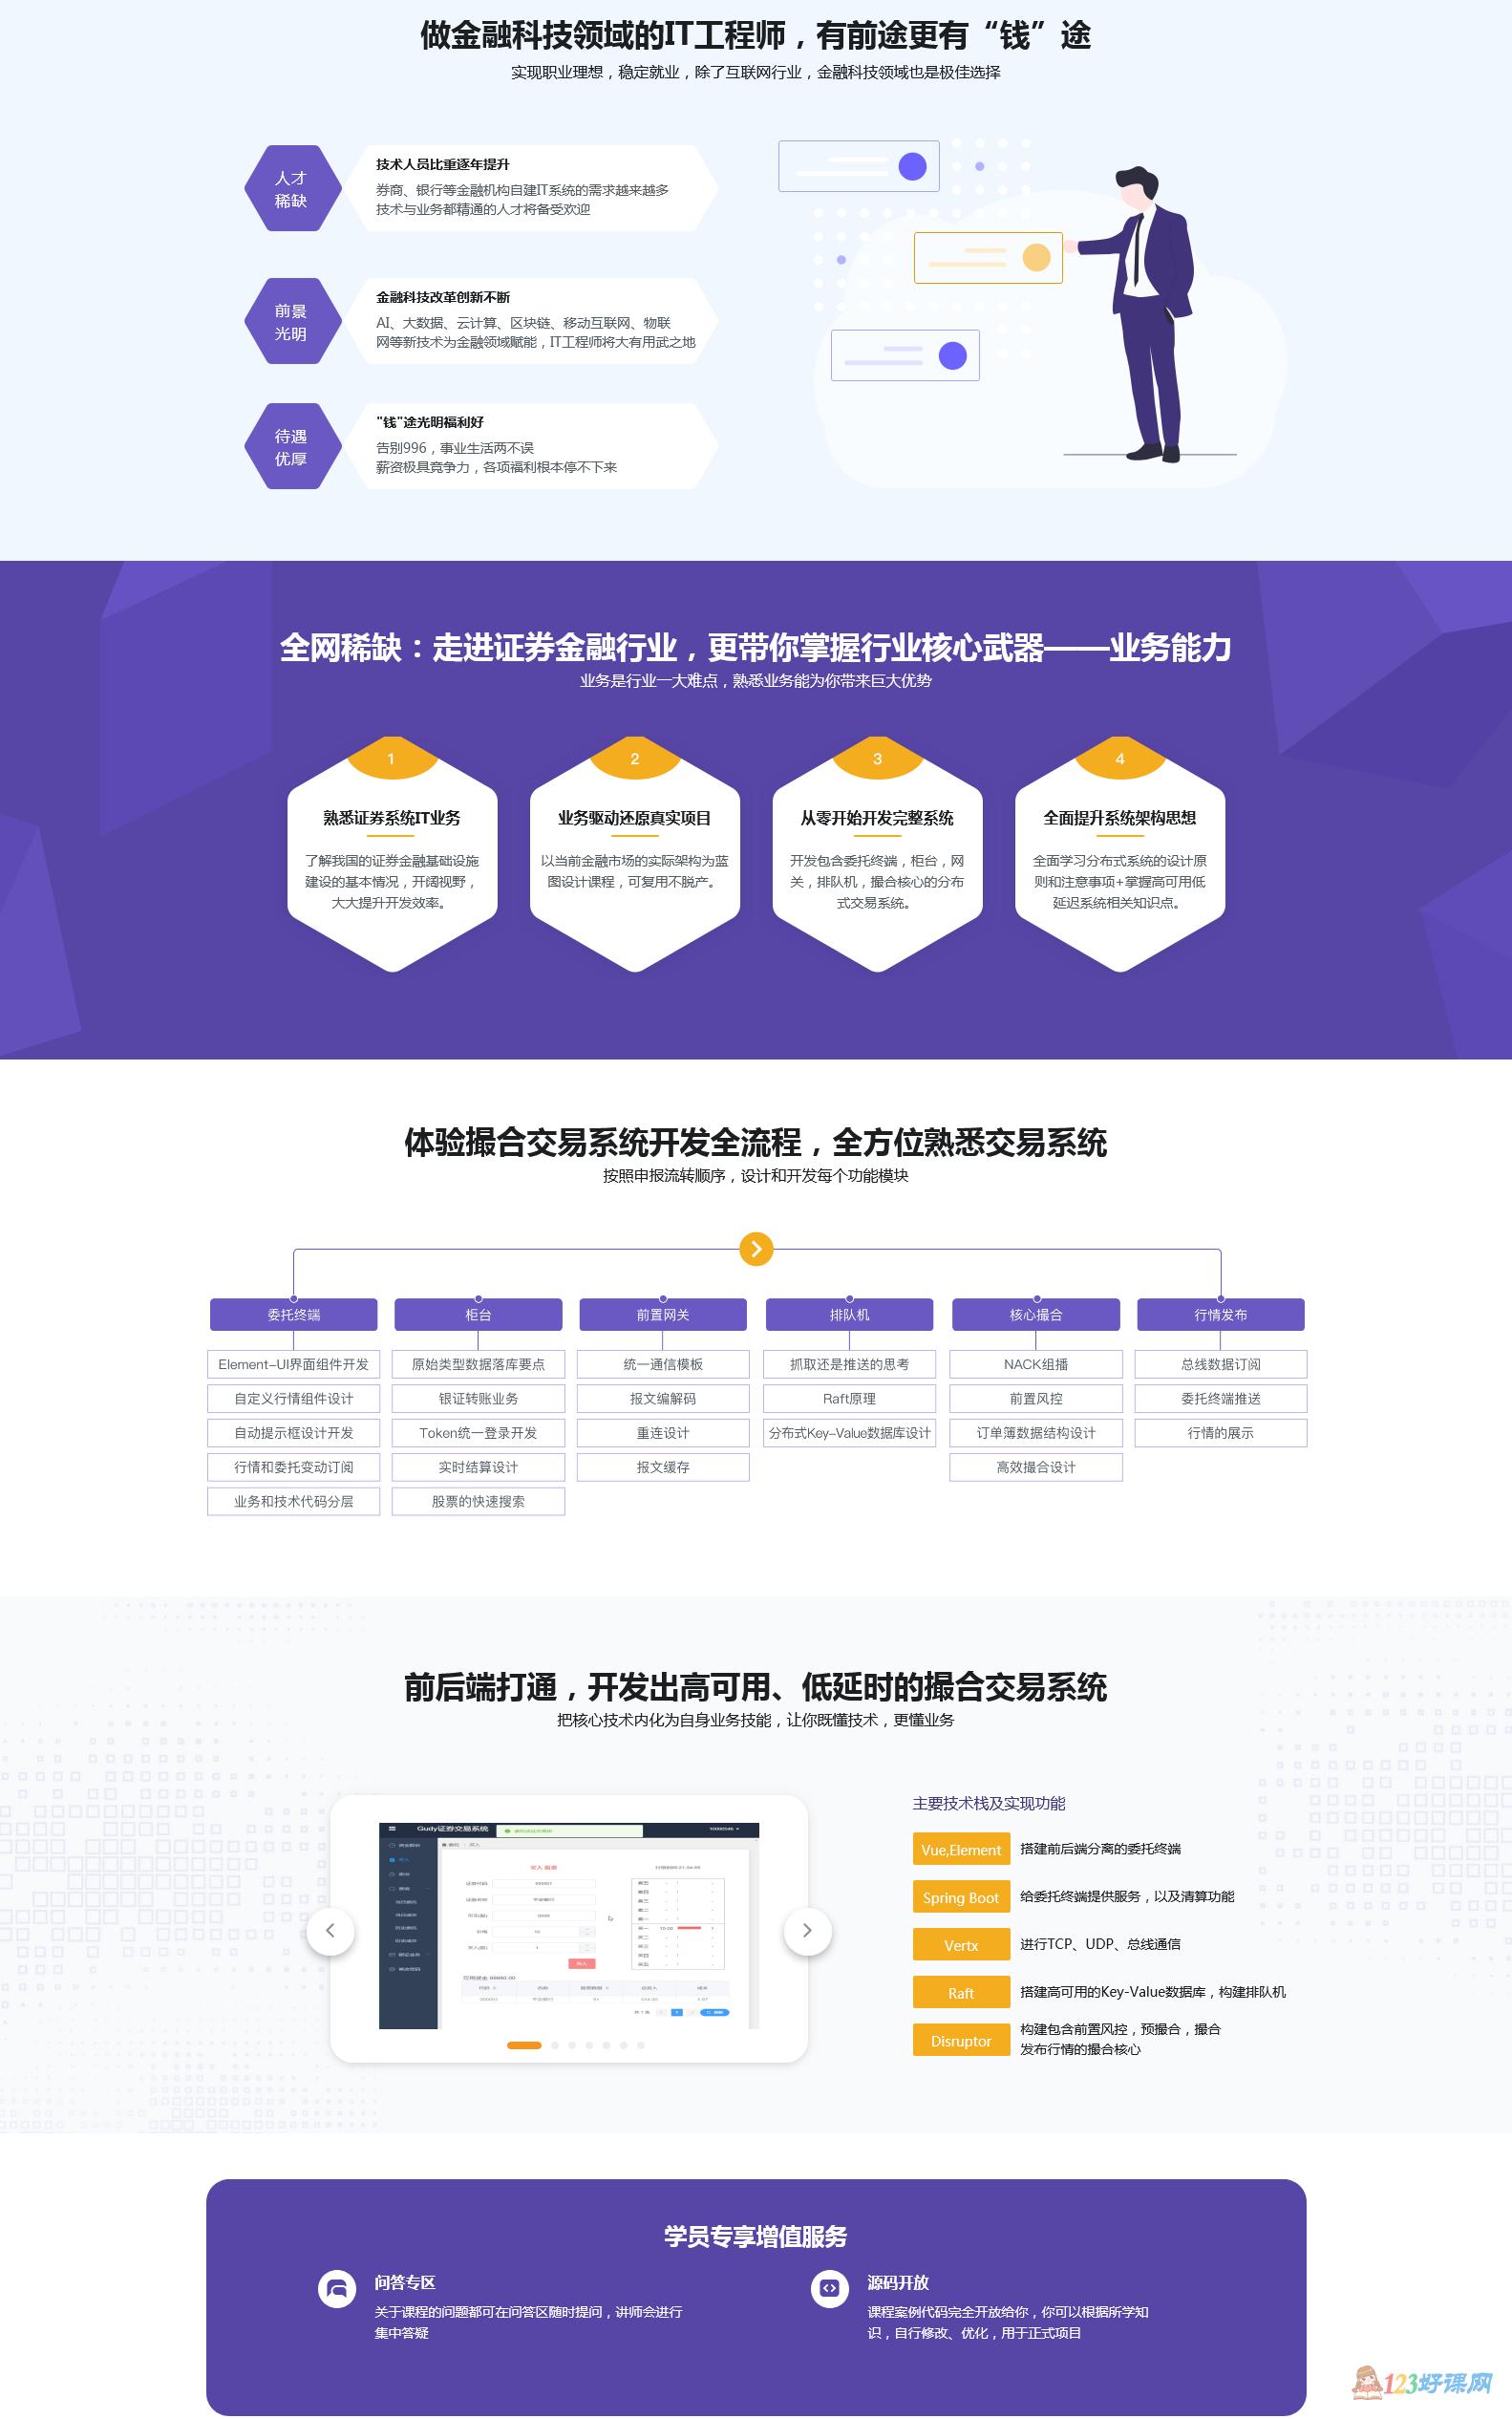 Spring Cloud+Vertx+Disruptor金融业撮合交易系统实战